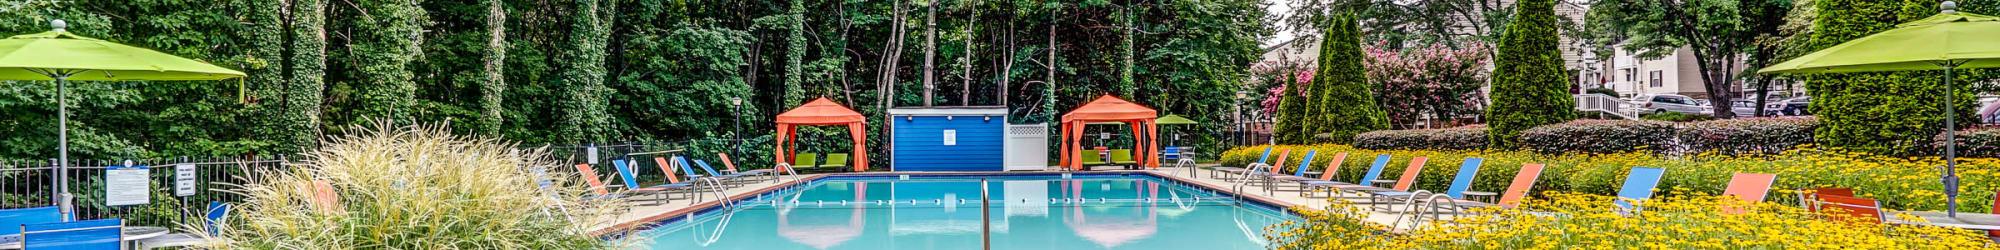 Swiming pool at Aston Ridge Apartments